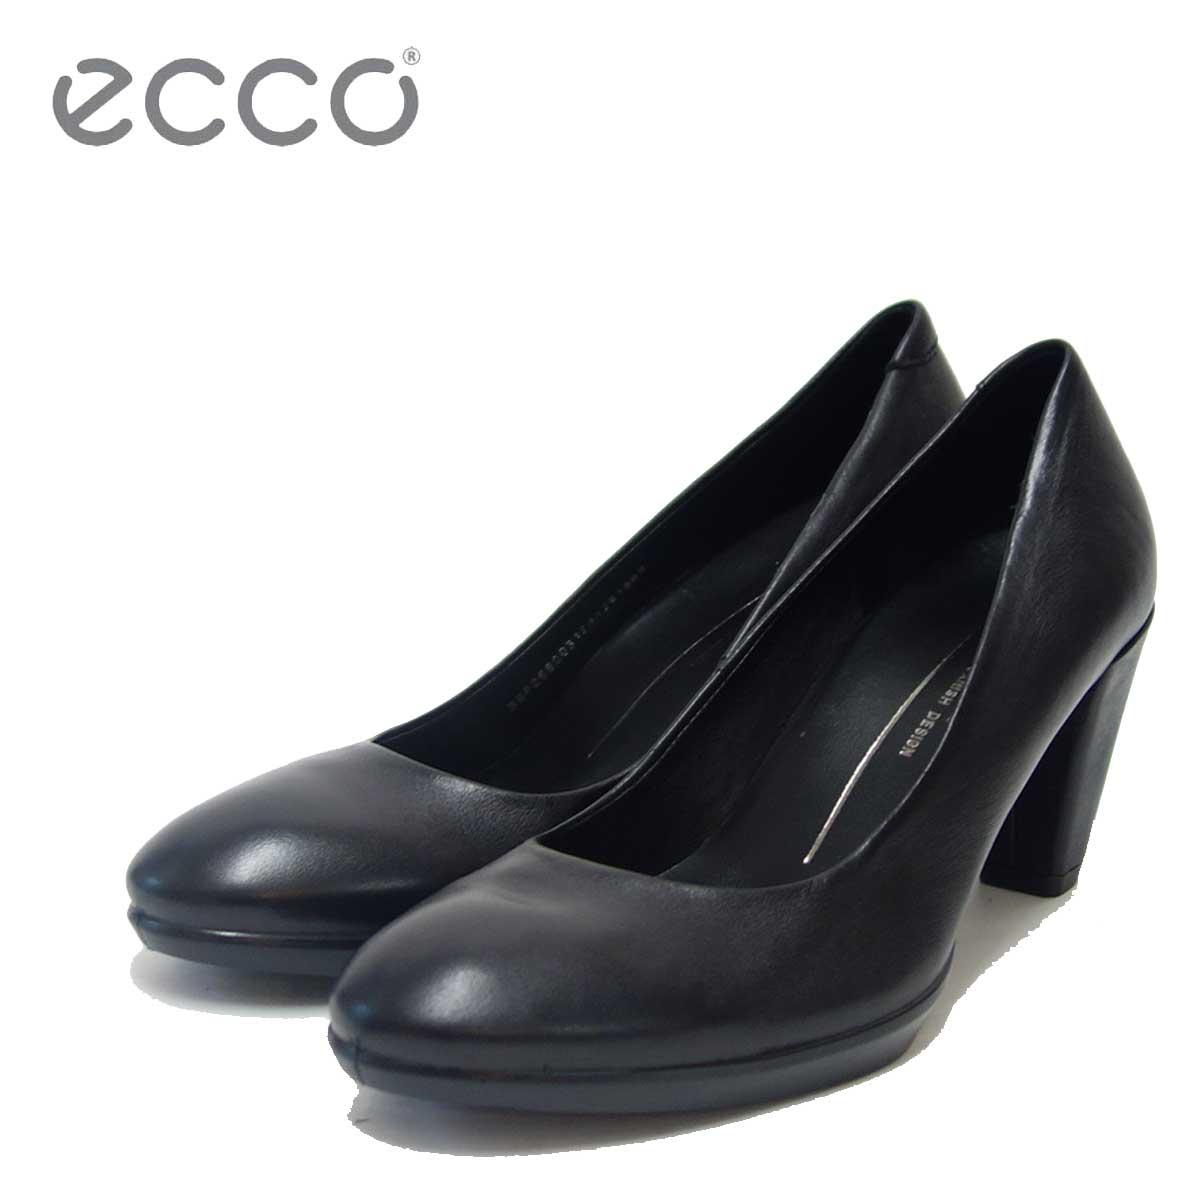 ECCO エコー 268003 ブラック (レディース)快適な履き心地のパンプス天然皮革コンフォートシューズ「靴」